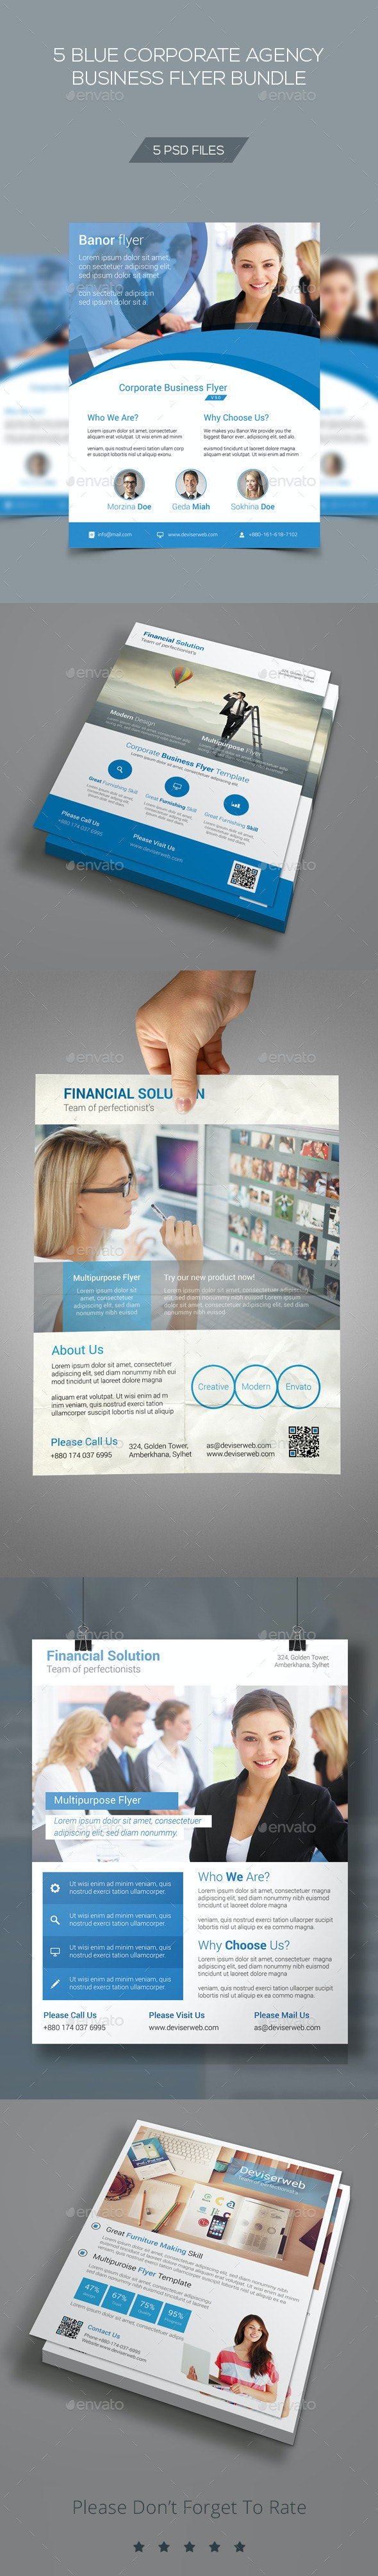 Blue Corporate Business Flyer Bundle V2 - Corporate Flyers